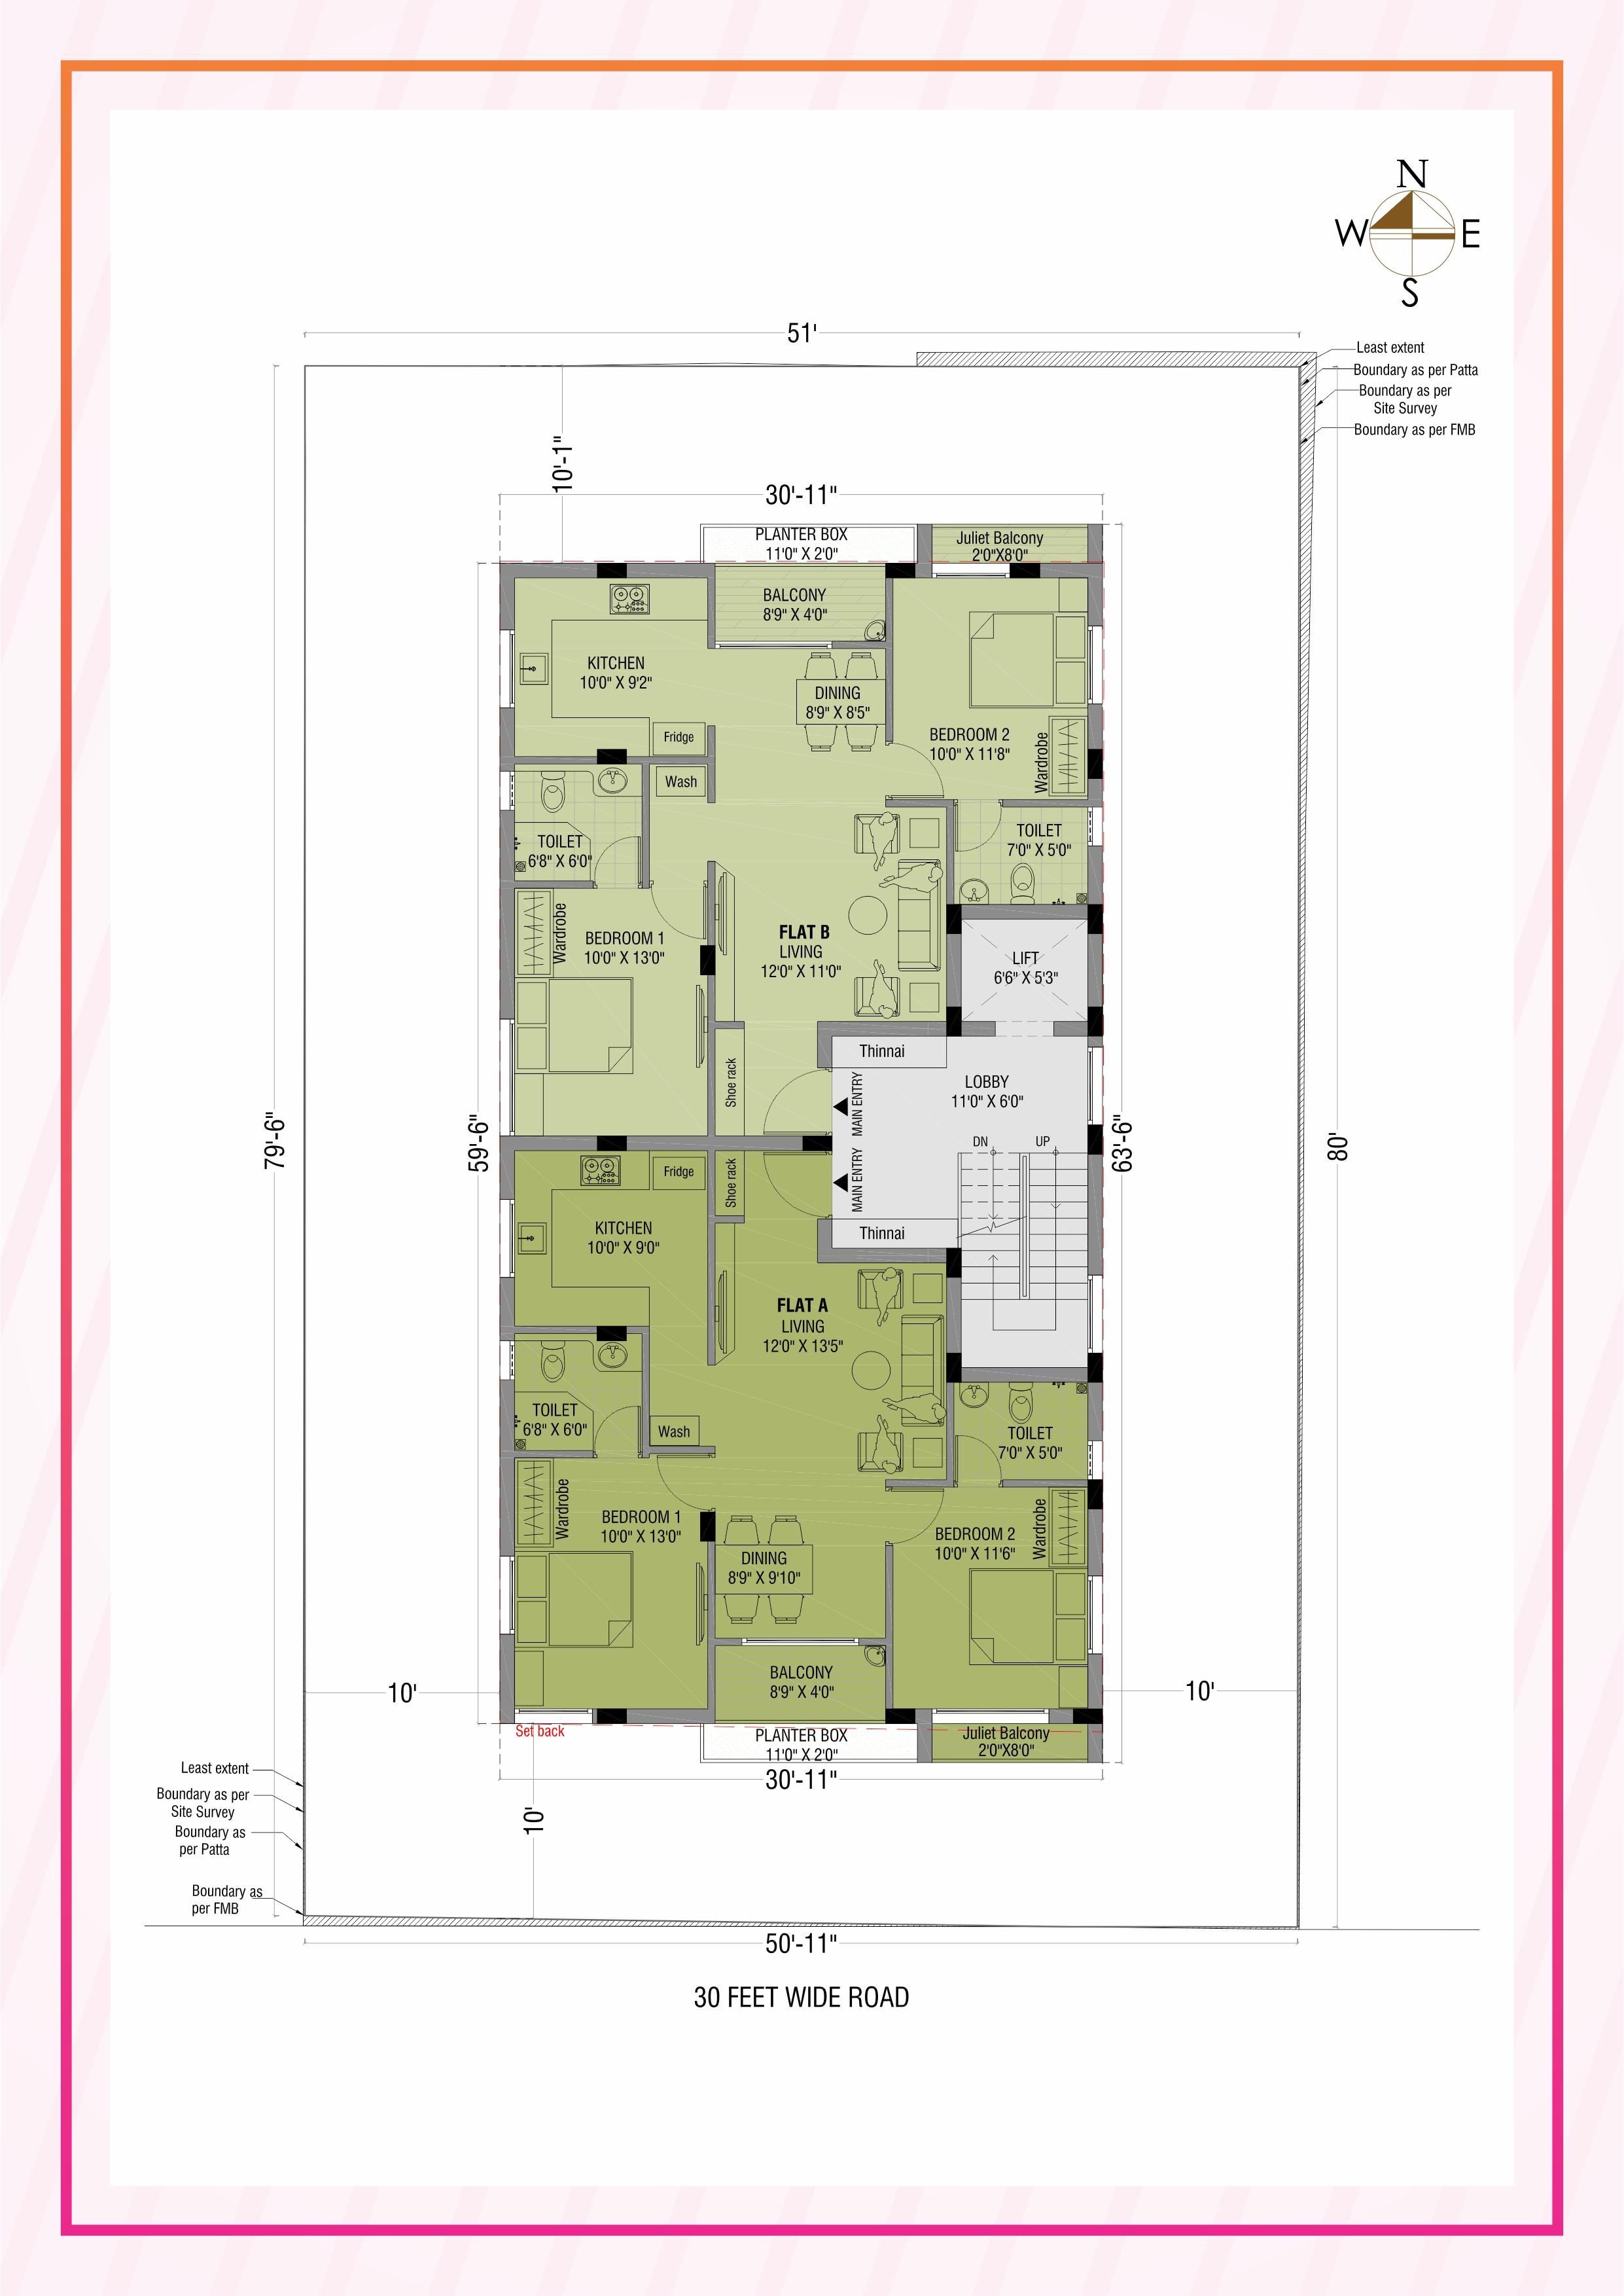 https://www.firmfoundations.in/projects/floorplans/thumbnails/15948115087Q_50_PLAN.jpg